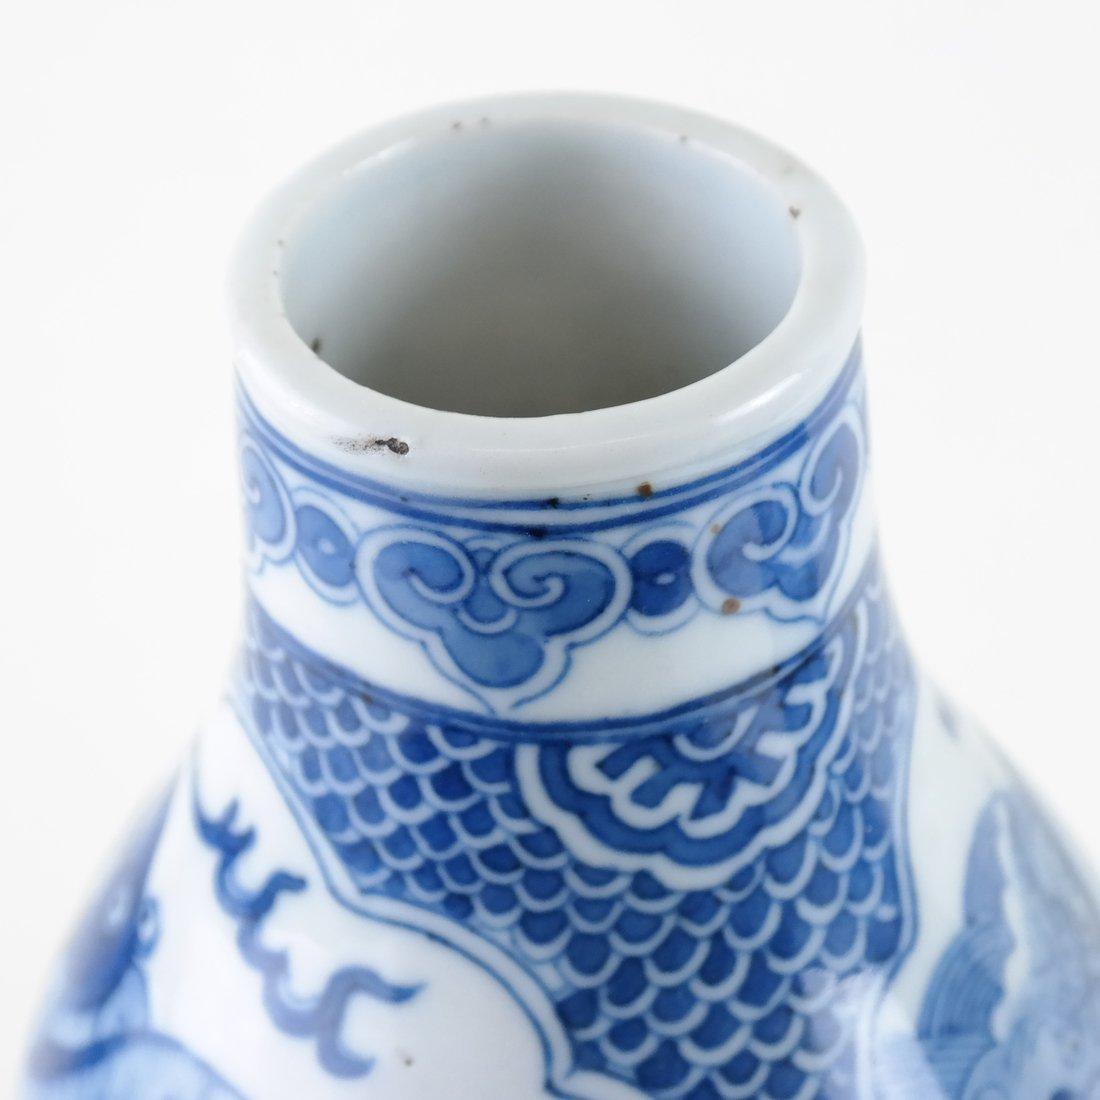 Pair of Asian-Style Blue & White Vases - 3